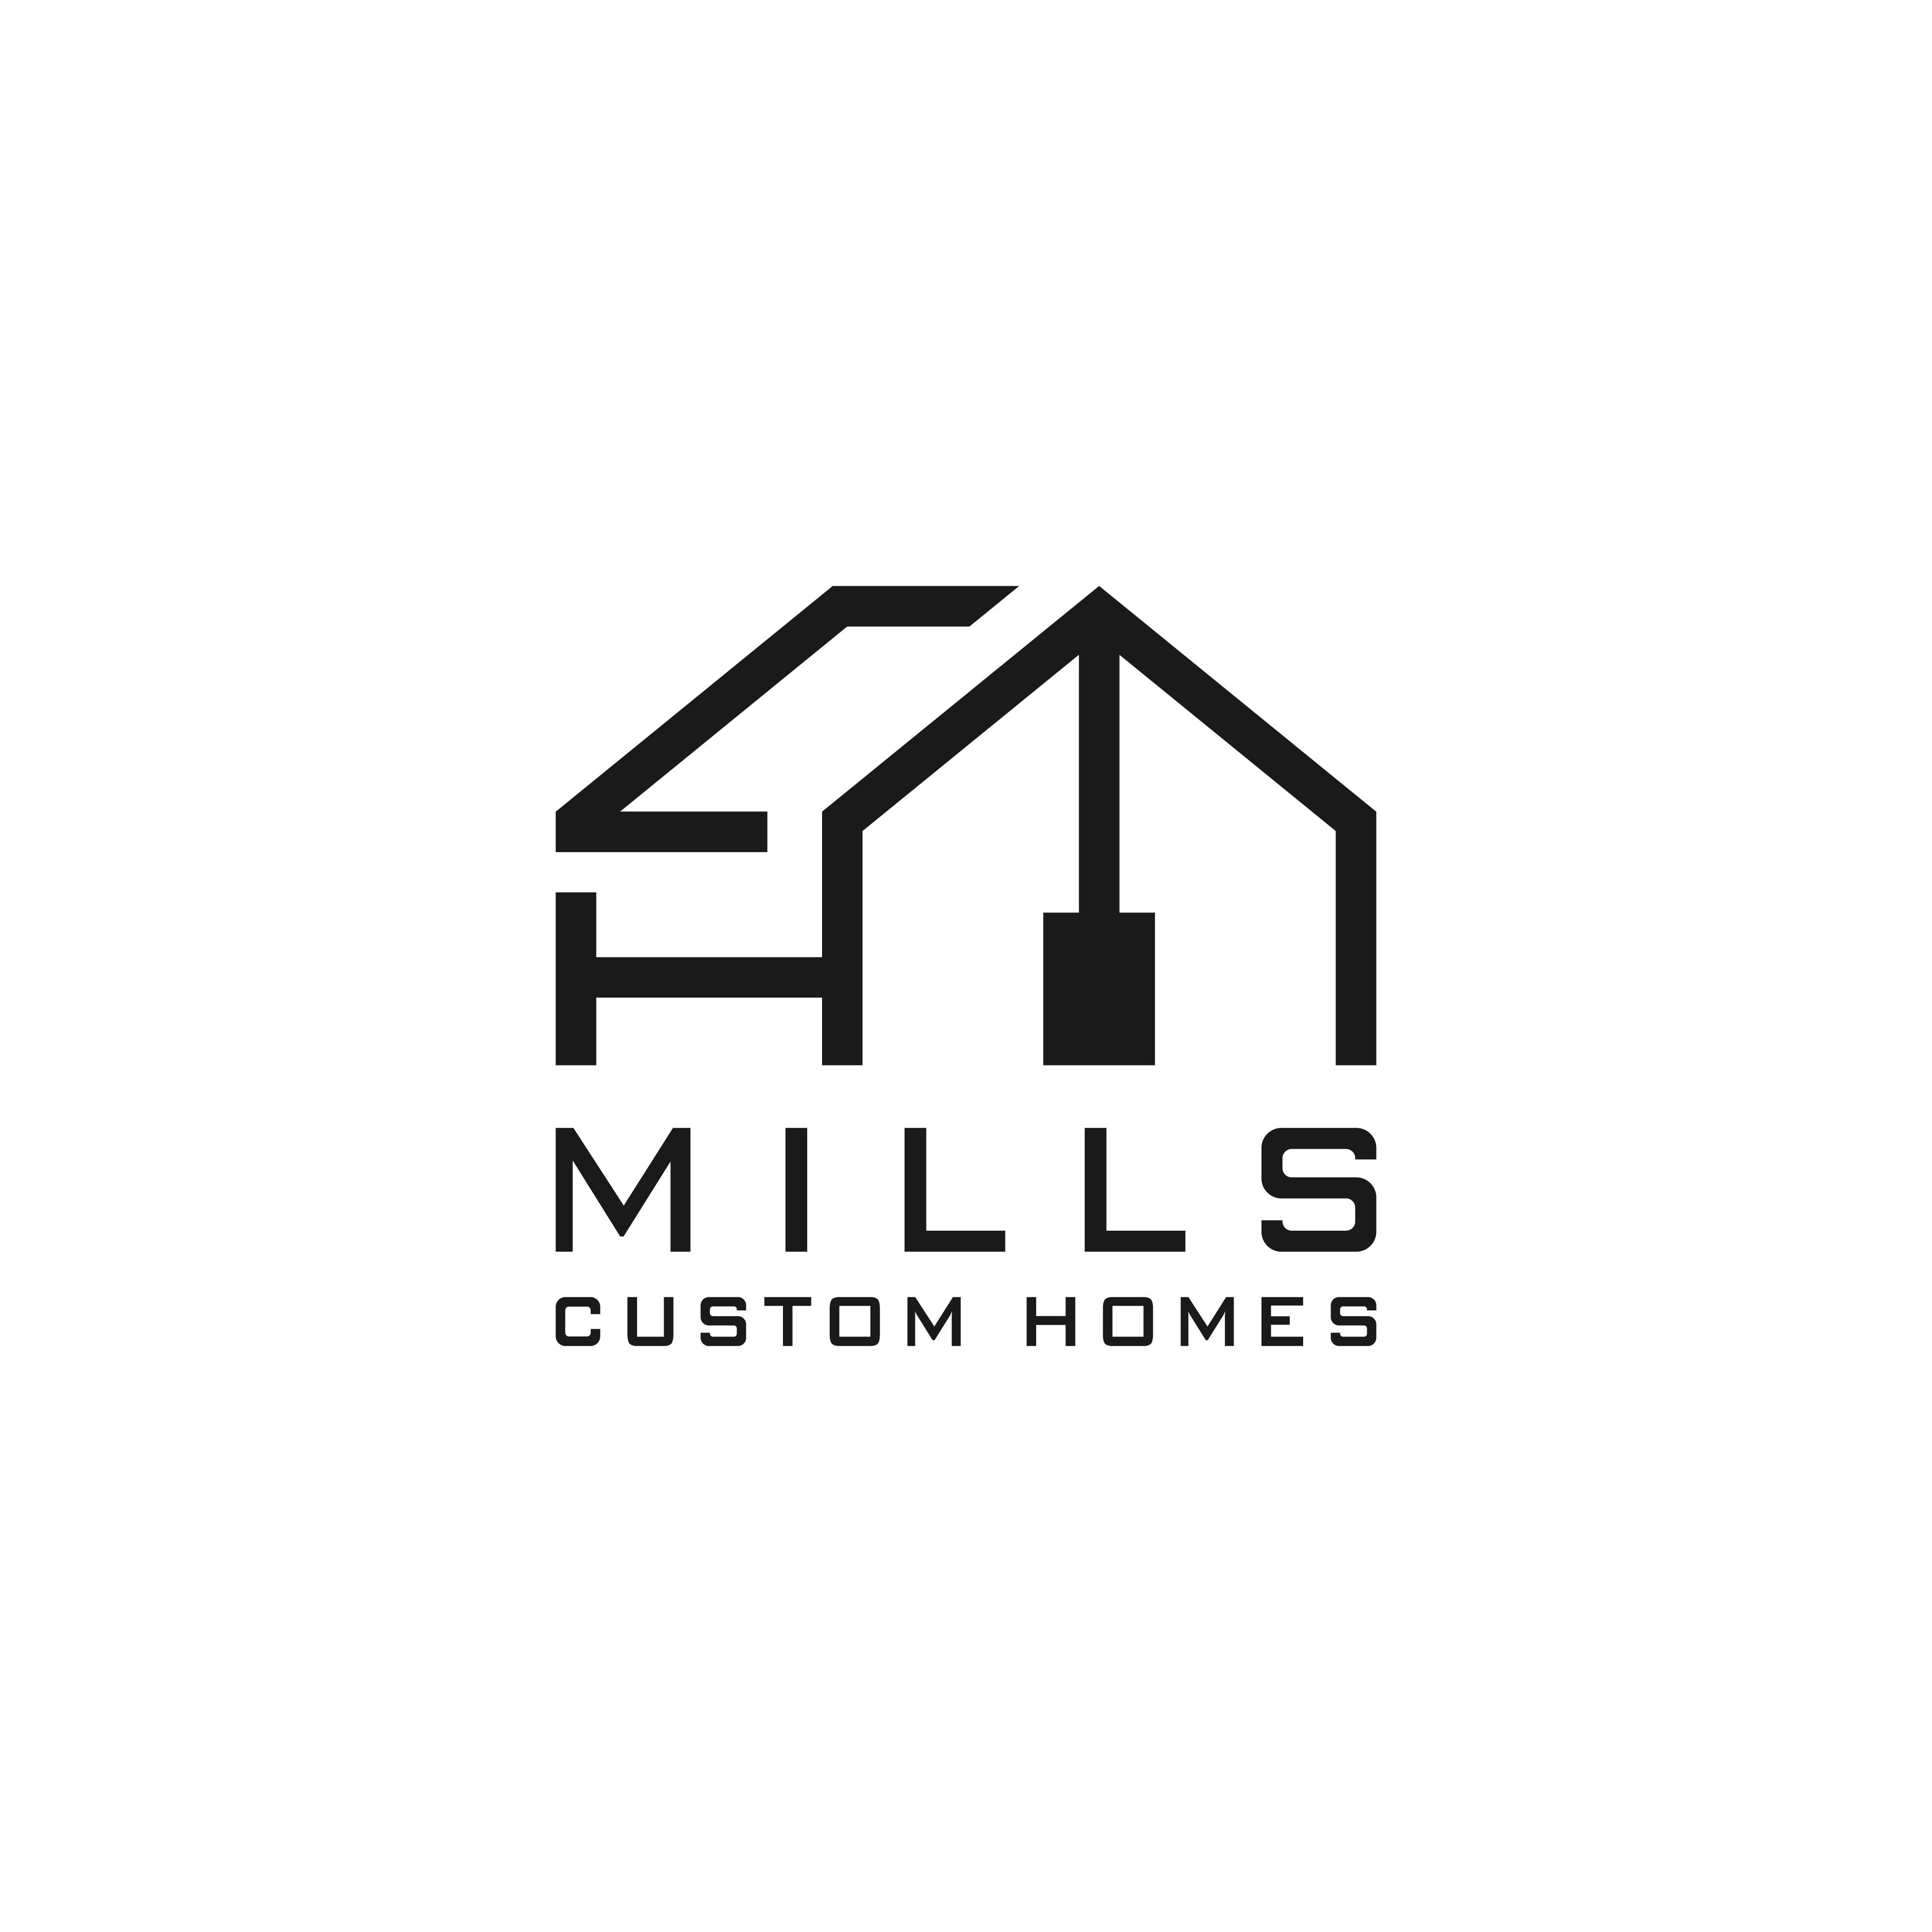 Create a Modern Farmhouse Inspired Logo for Mills Custom Homes